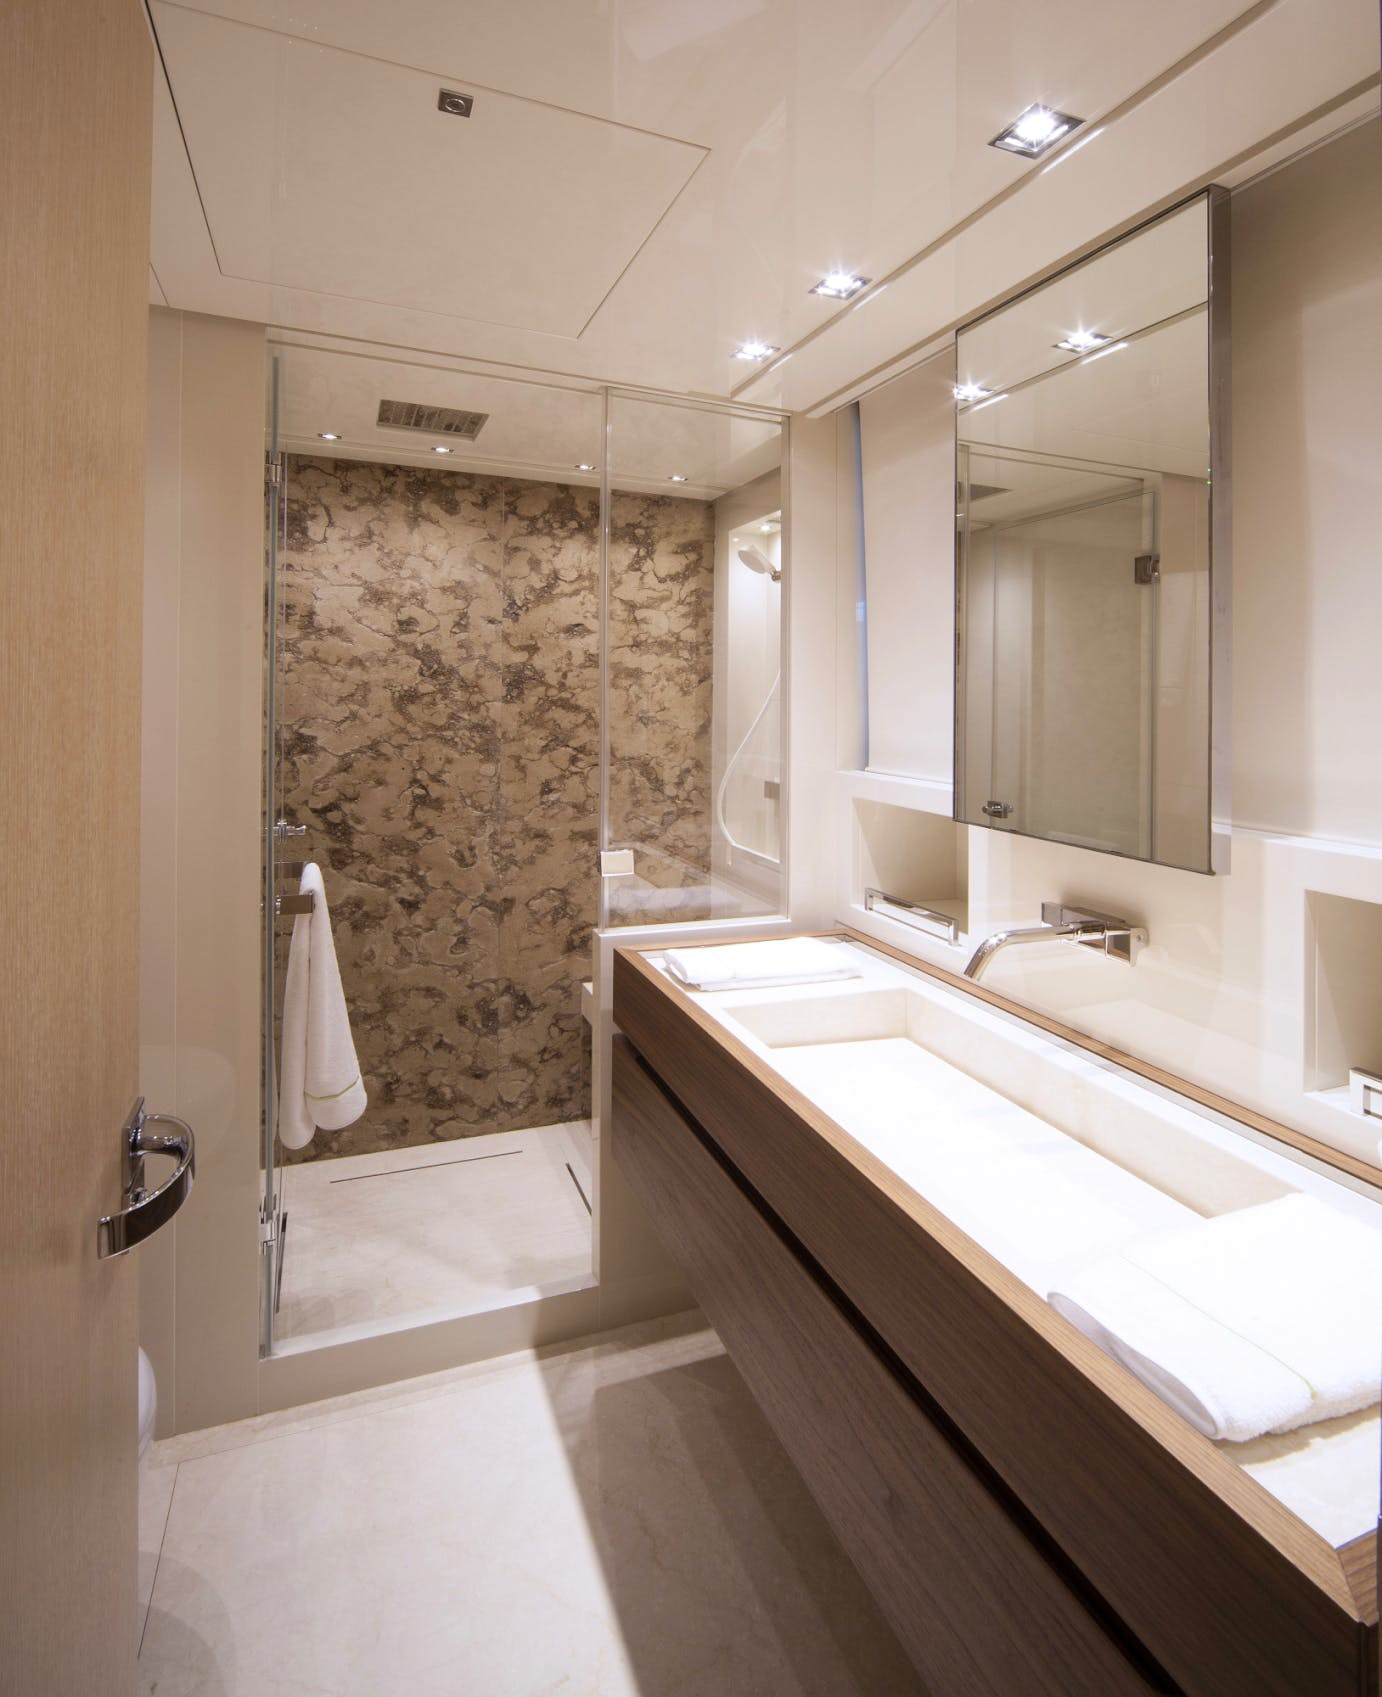 Guest Suite - Ensuite Bathroom